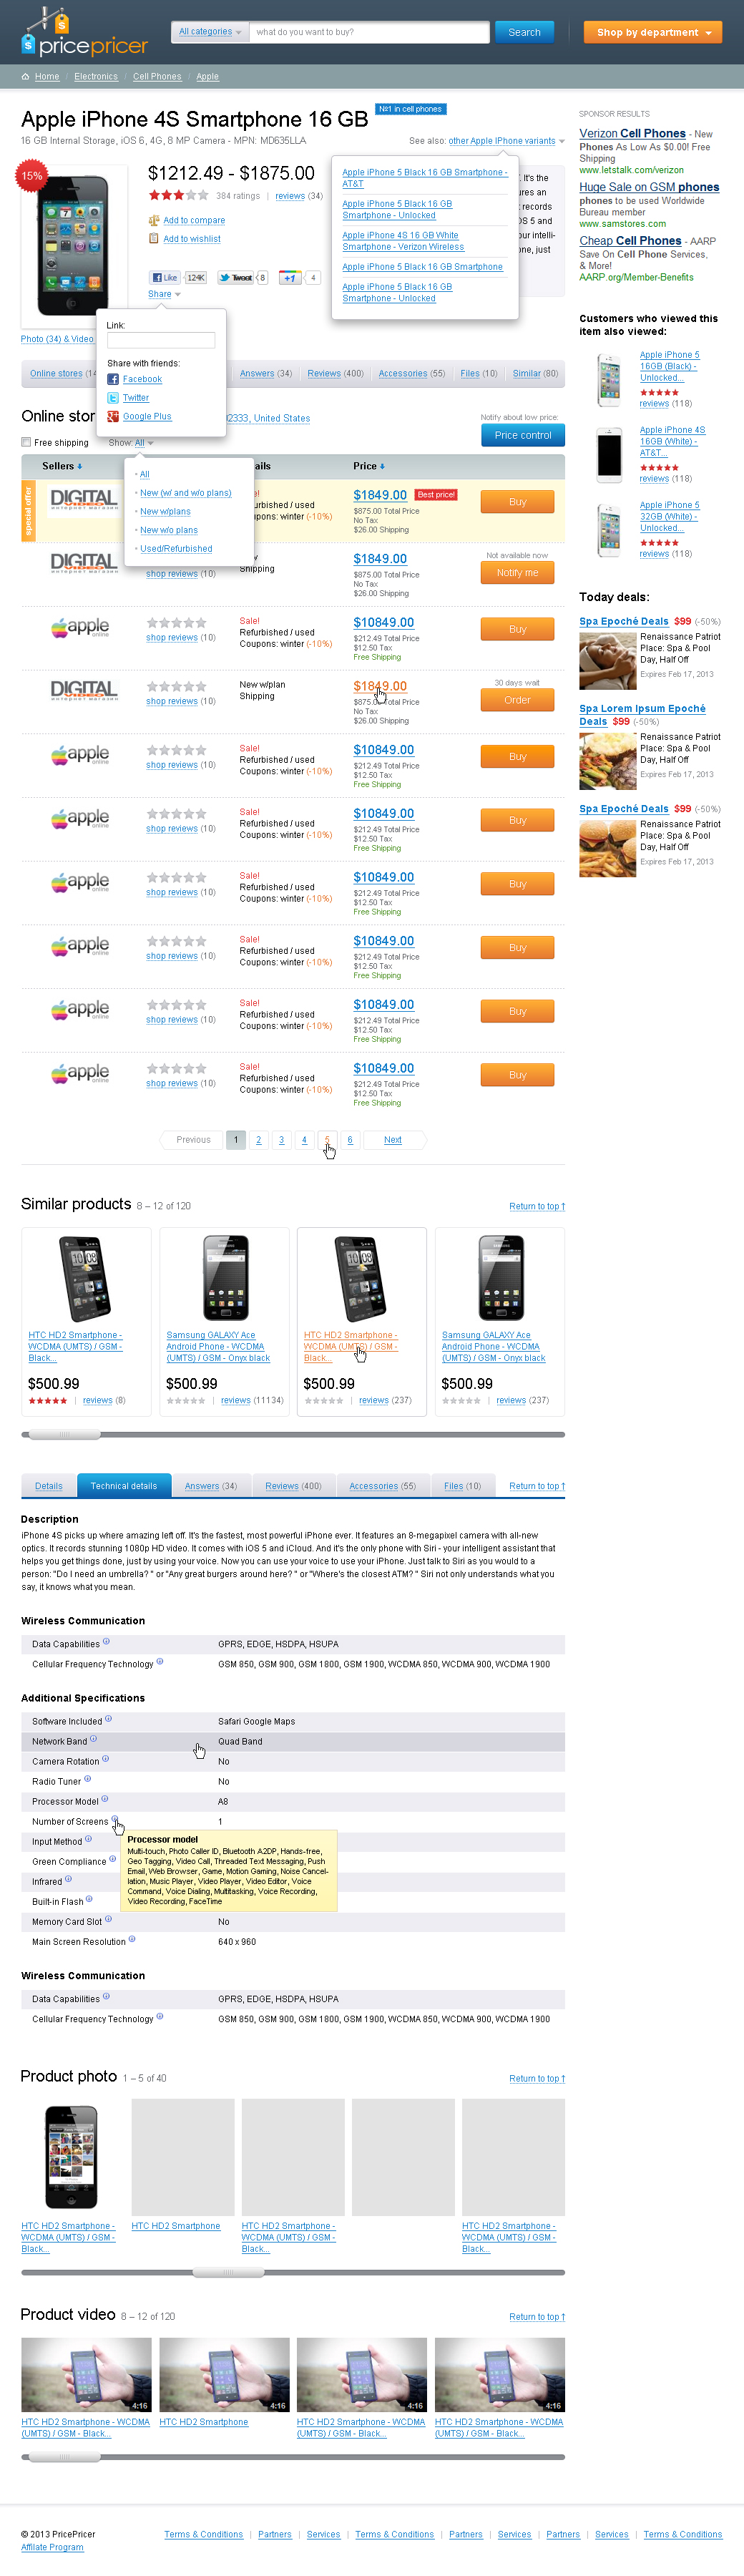 PricePricer - Сравнение цен на товары